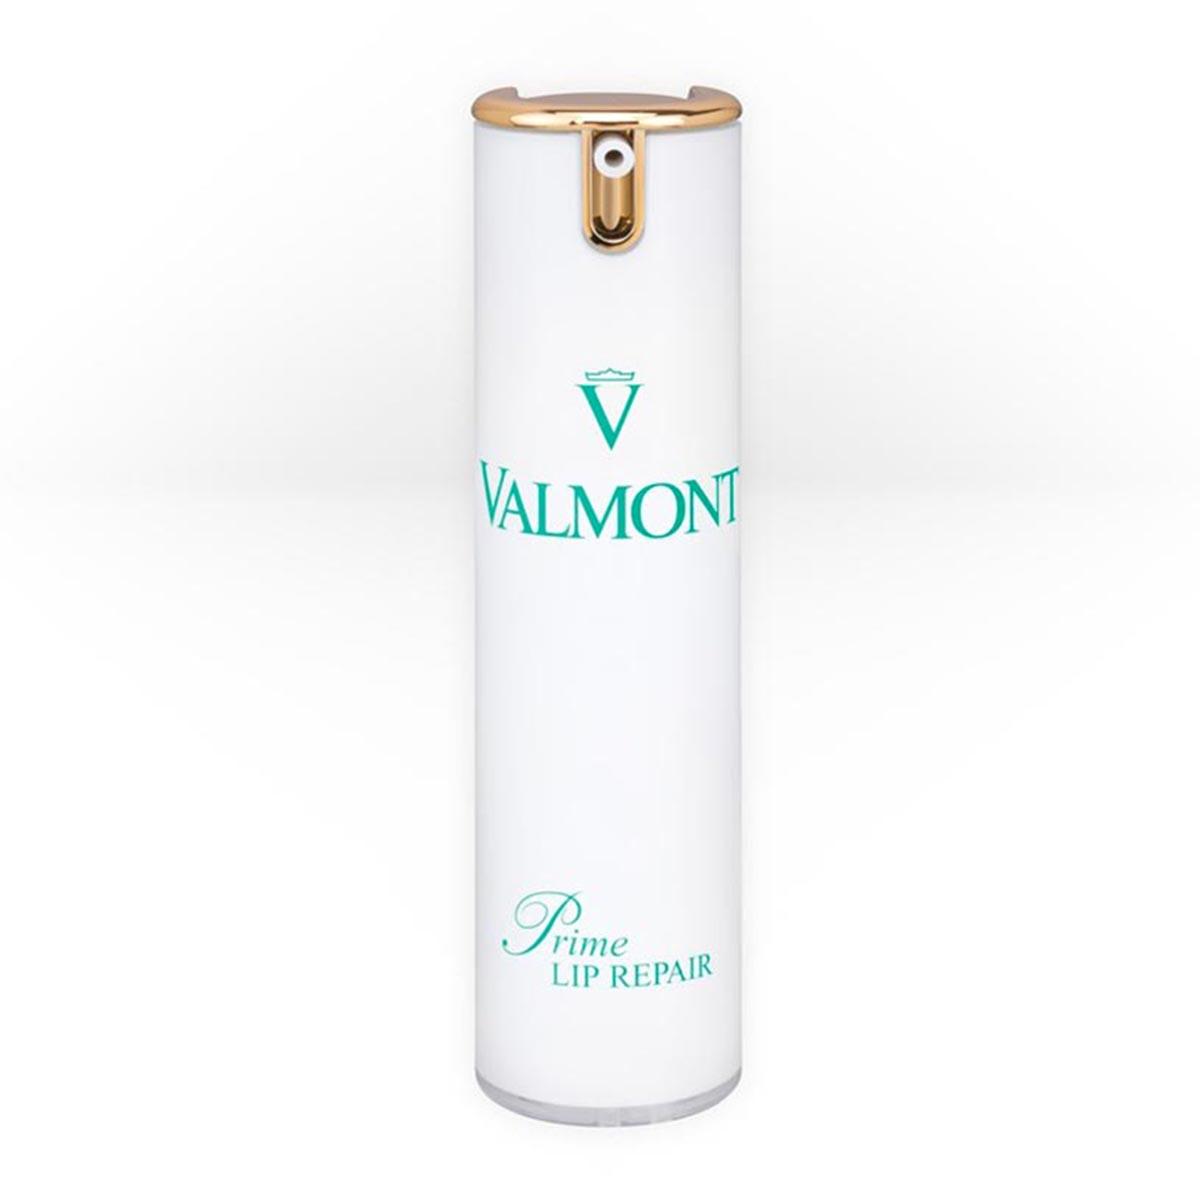 Valmont energy prime lip repair 15ml